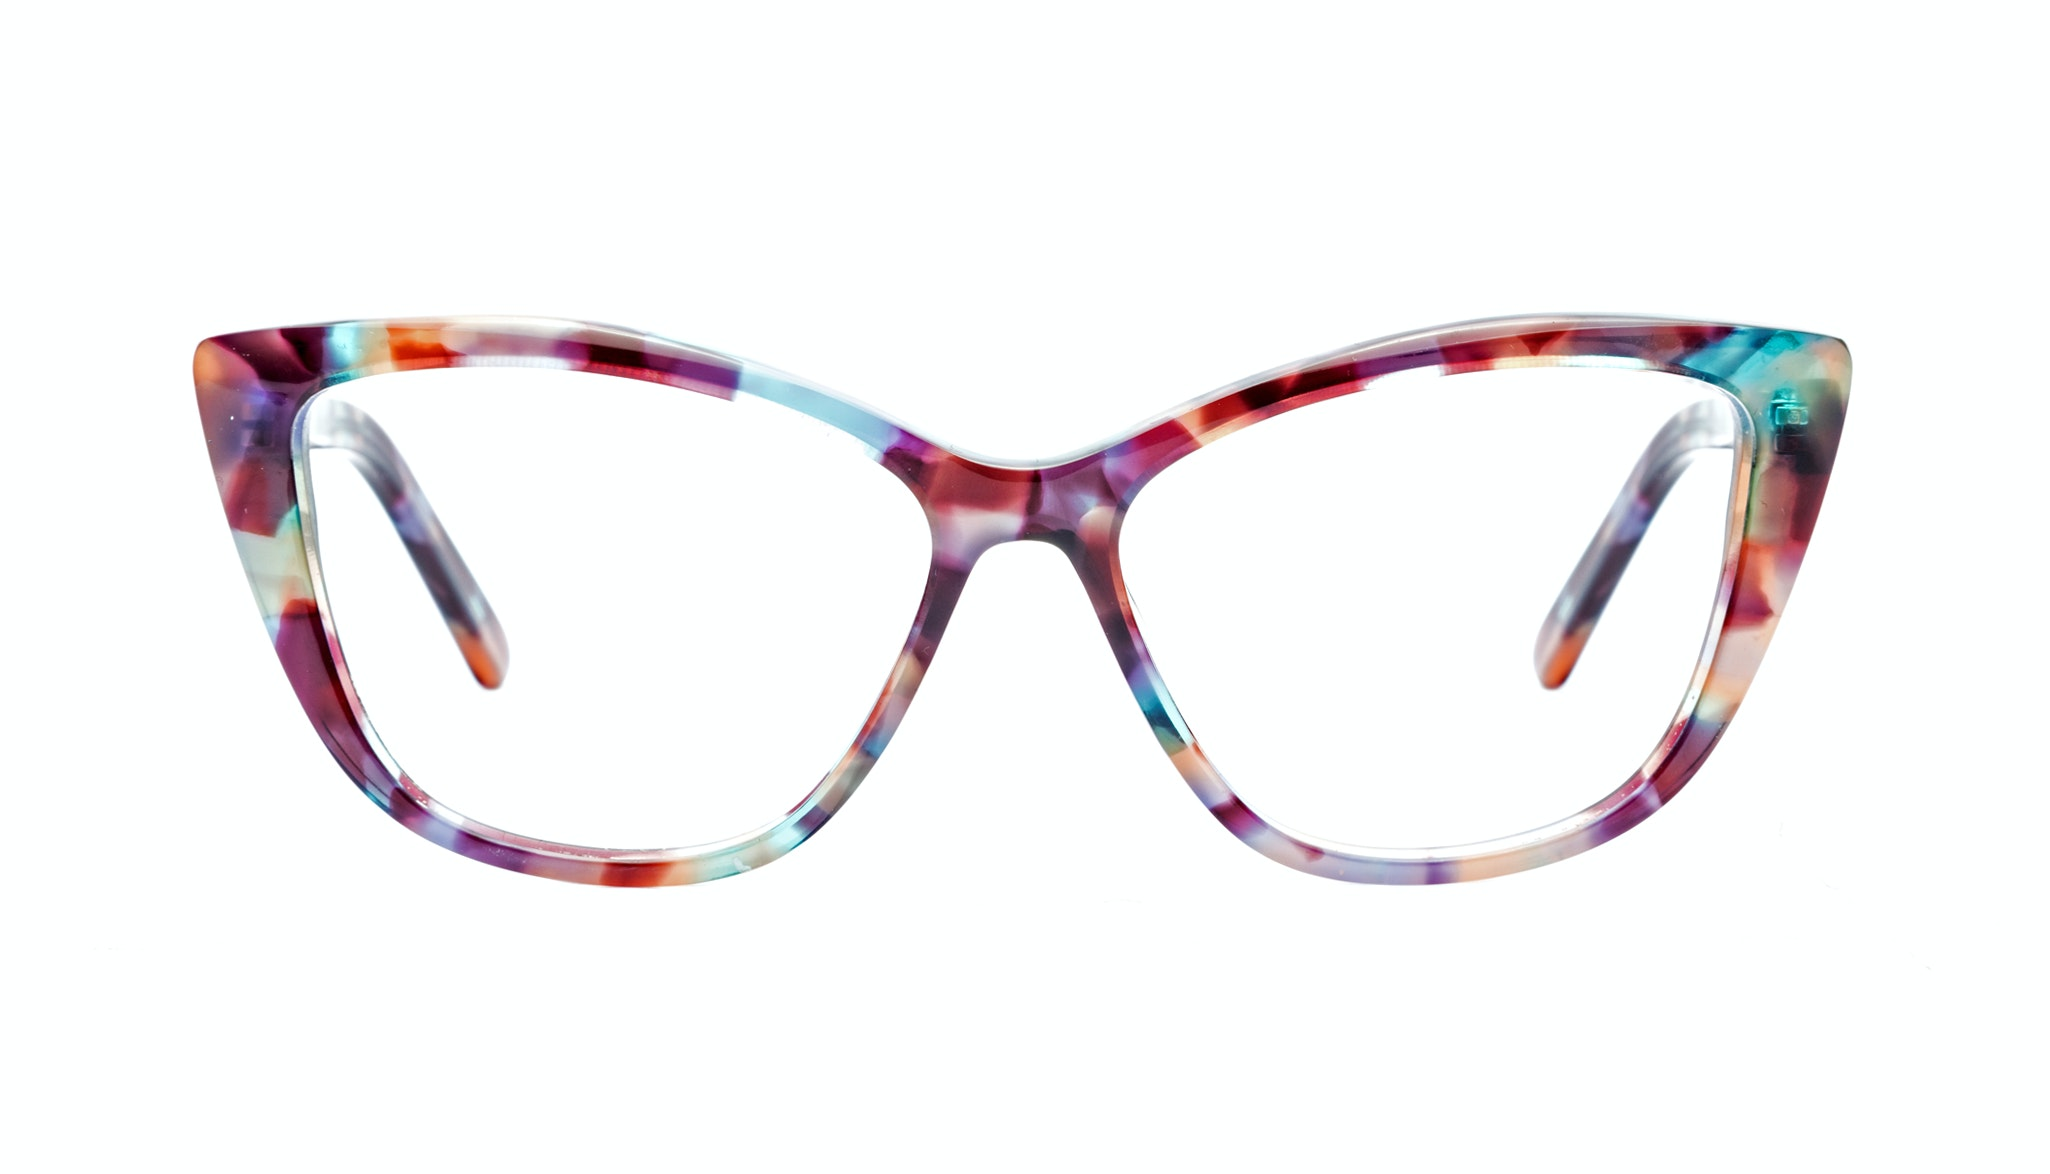 Affordable Fashion Glasses Cat Eye Eyeglasses Women Dolled Up Dazzling Front